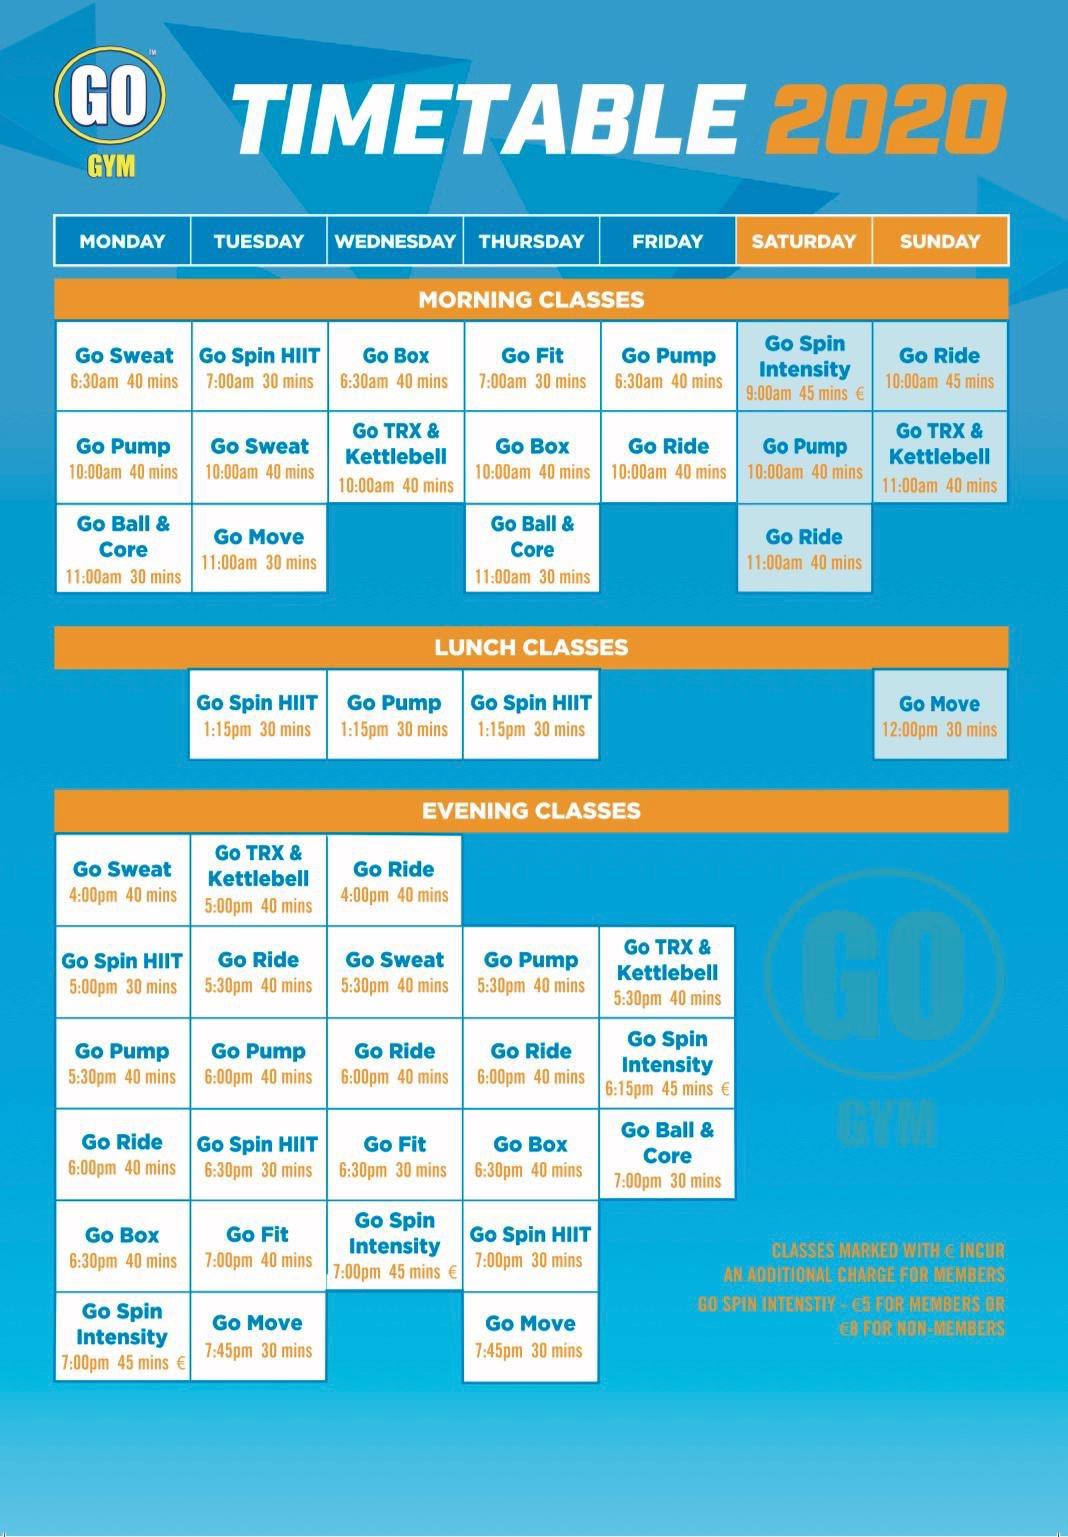 Timetable 2020